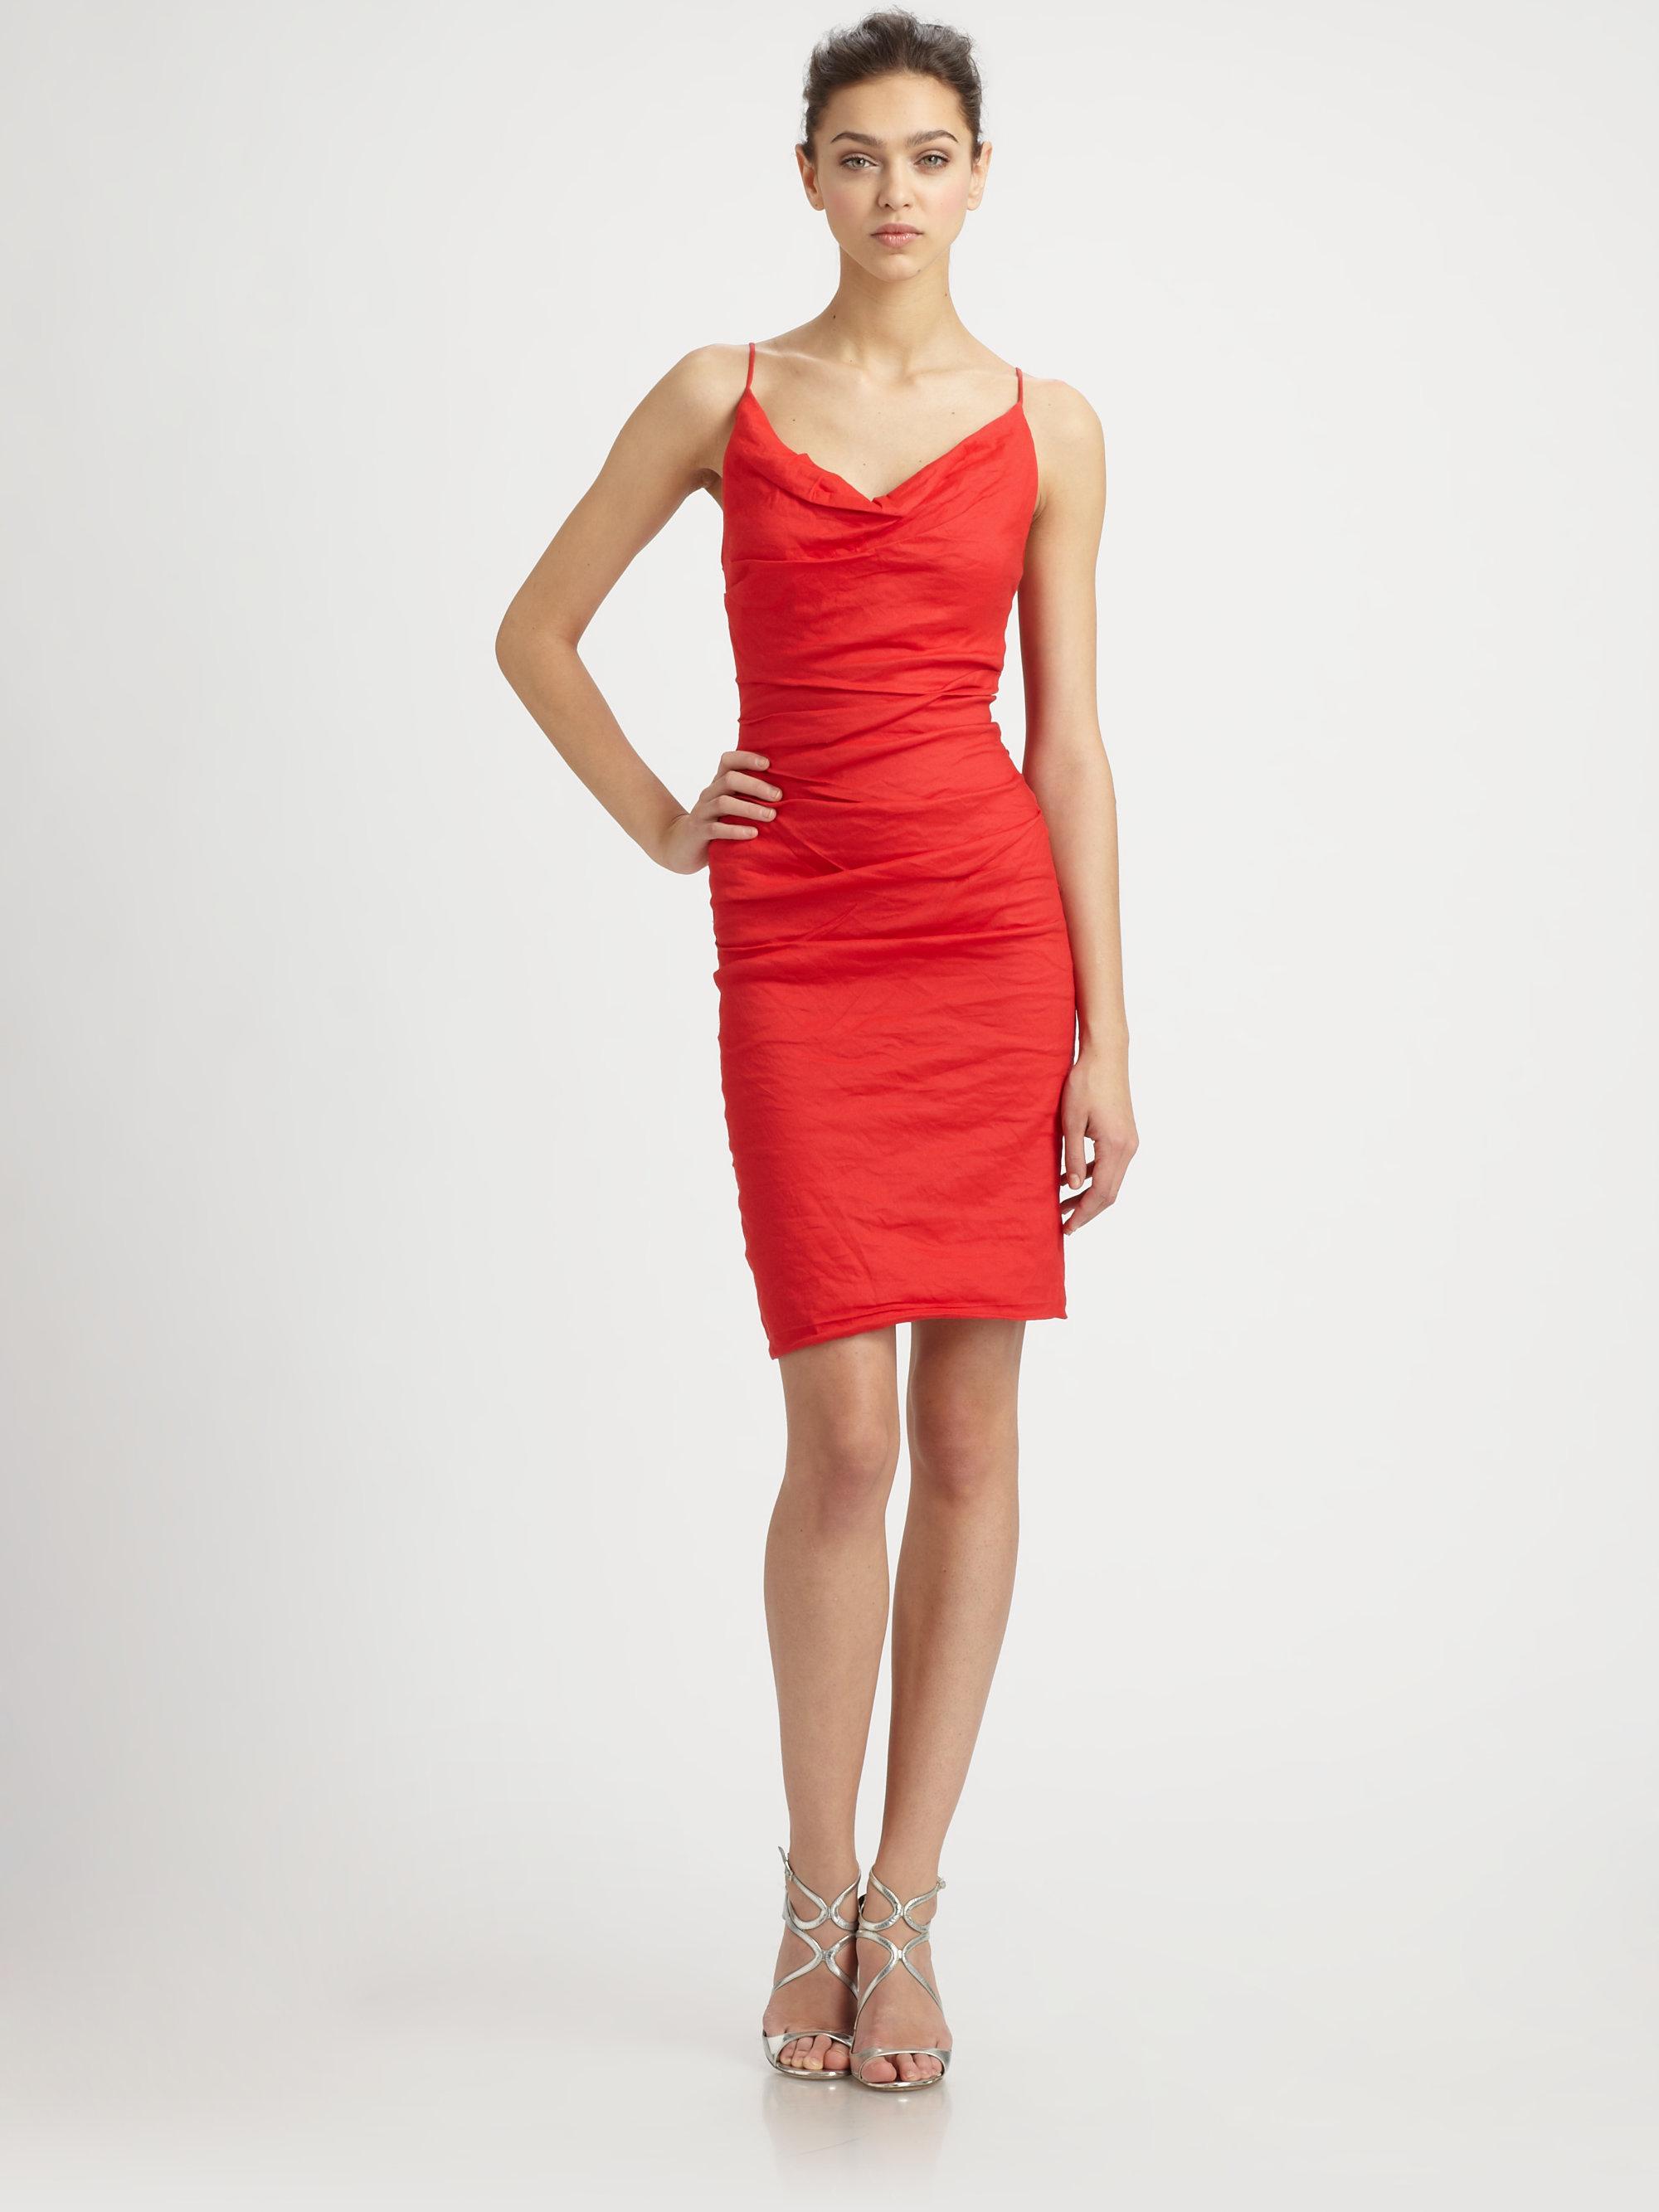 Lyst - Nicole miller Cowl Neck Dress